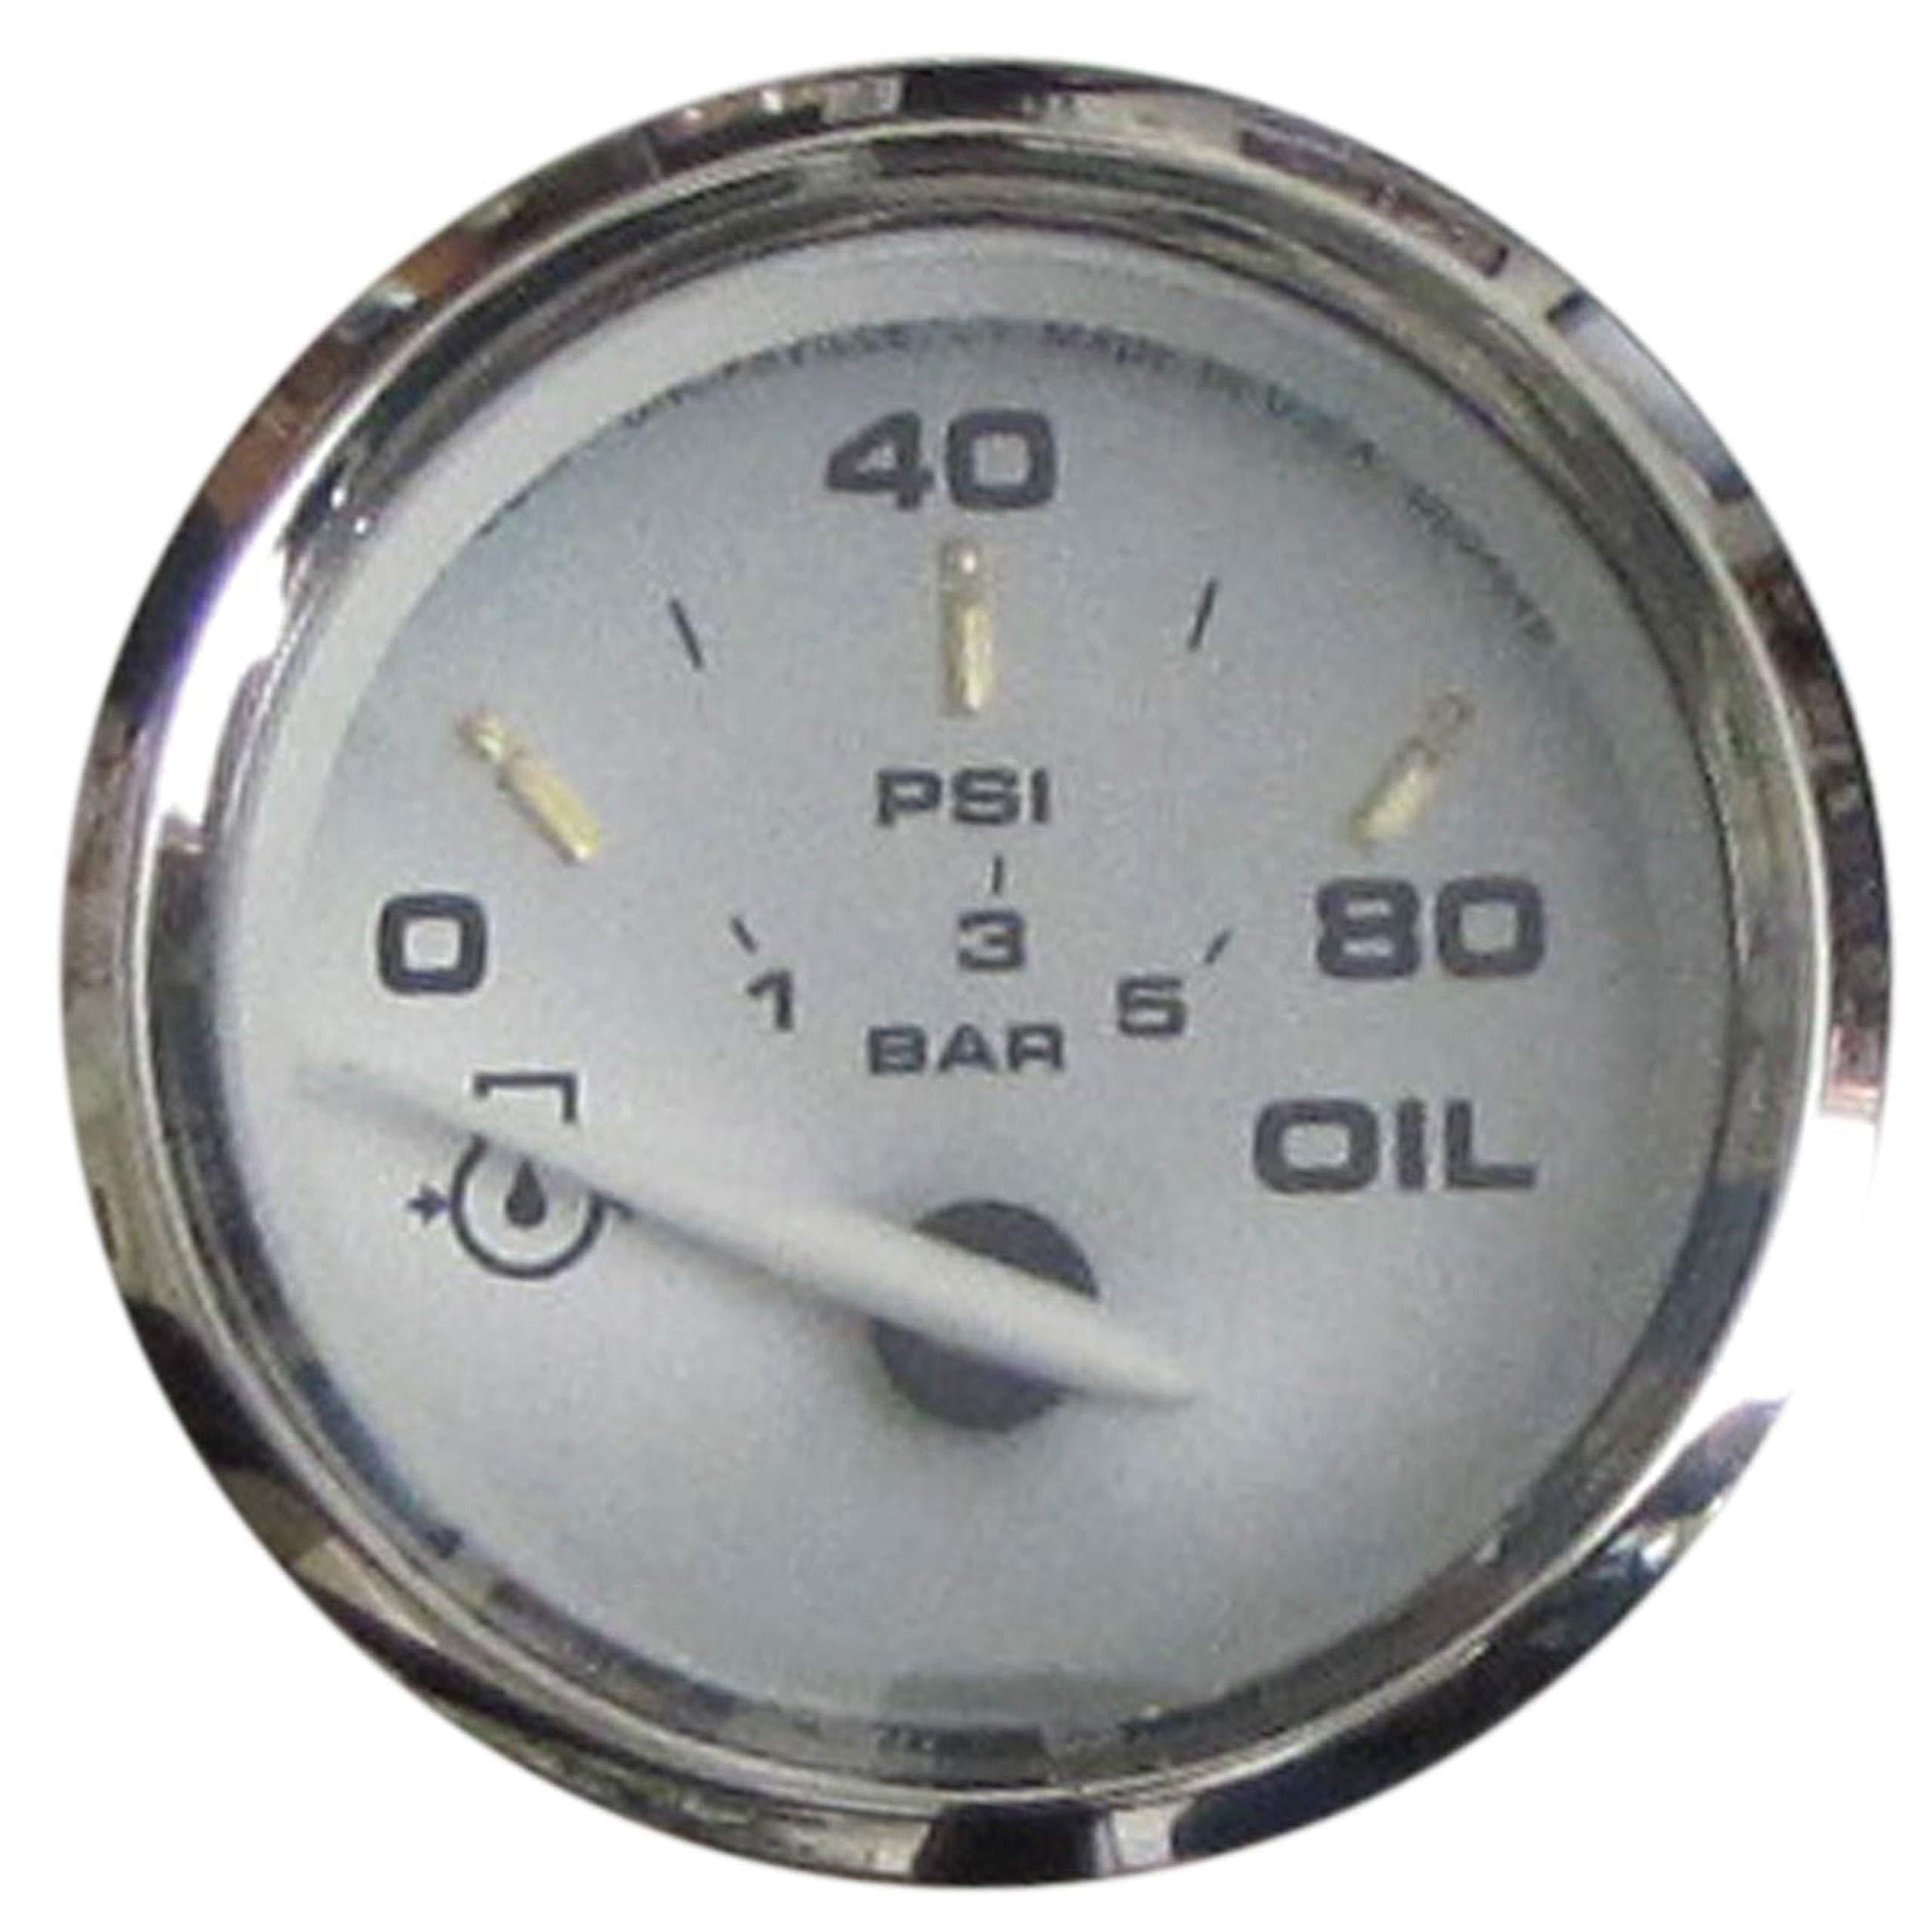 Faria One Size 19002 Kronos Oil Pressure Gauge by Faria